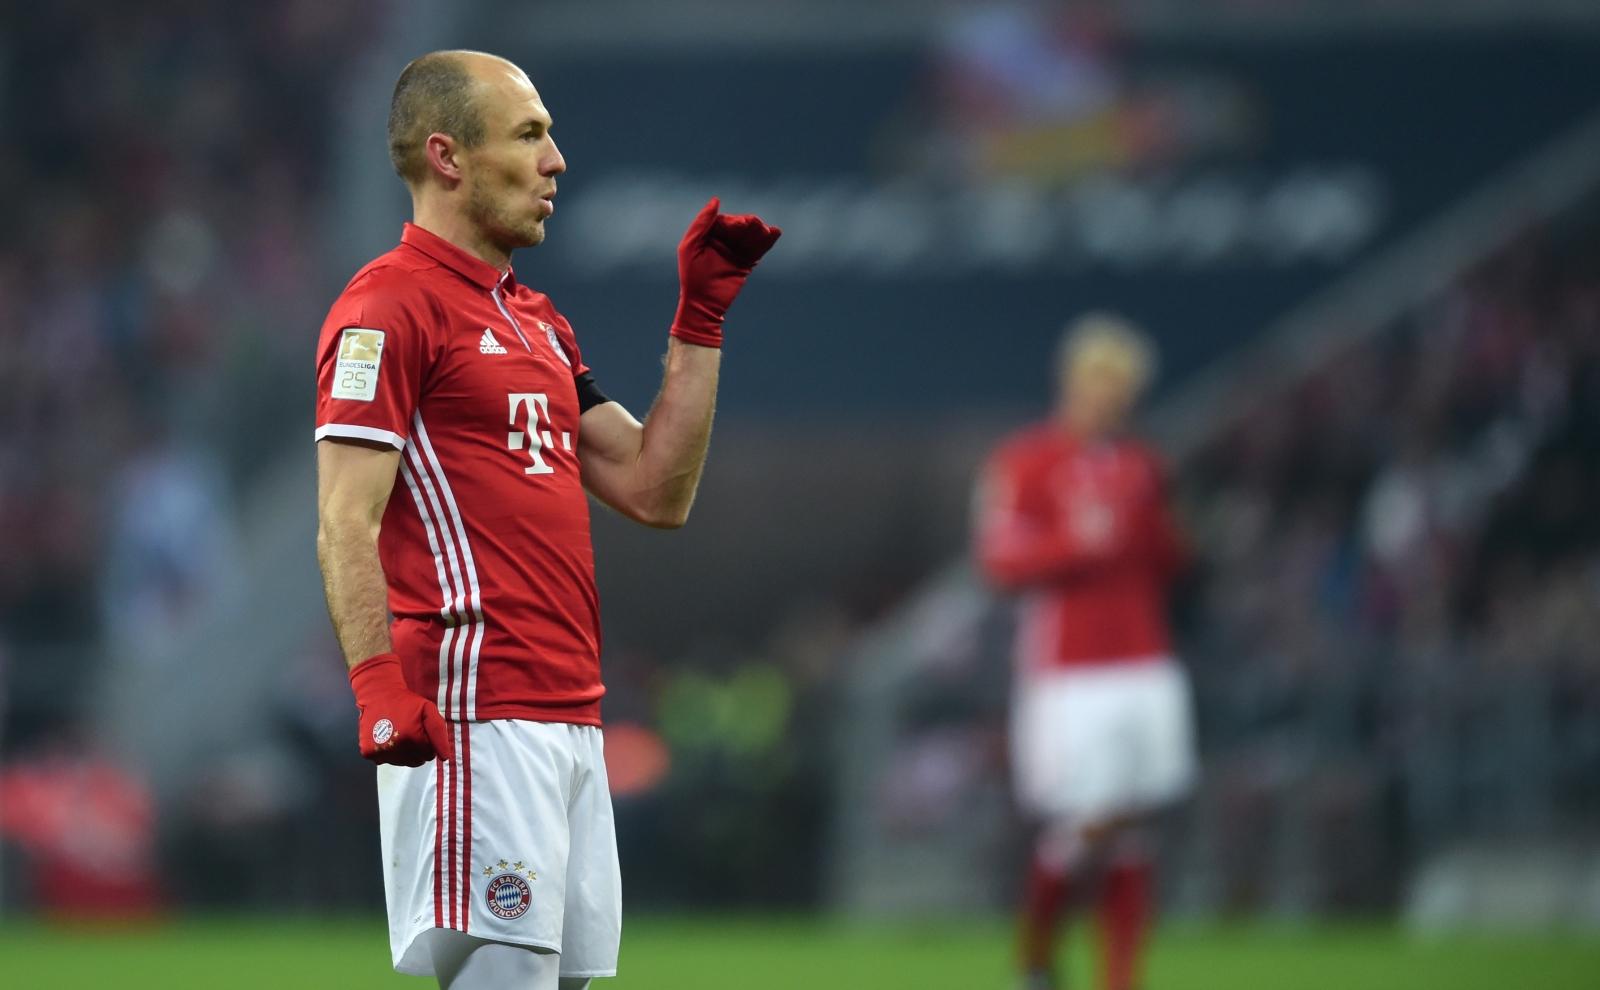 Where will Arjen Robben play next season